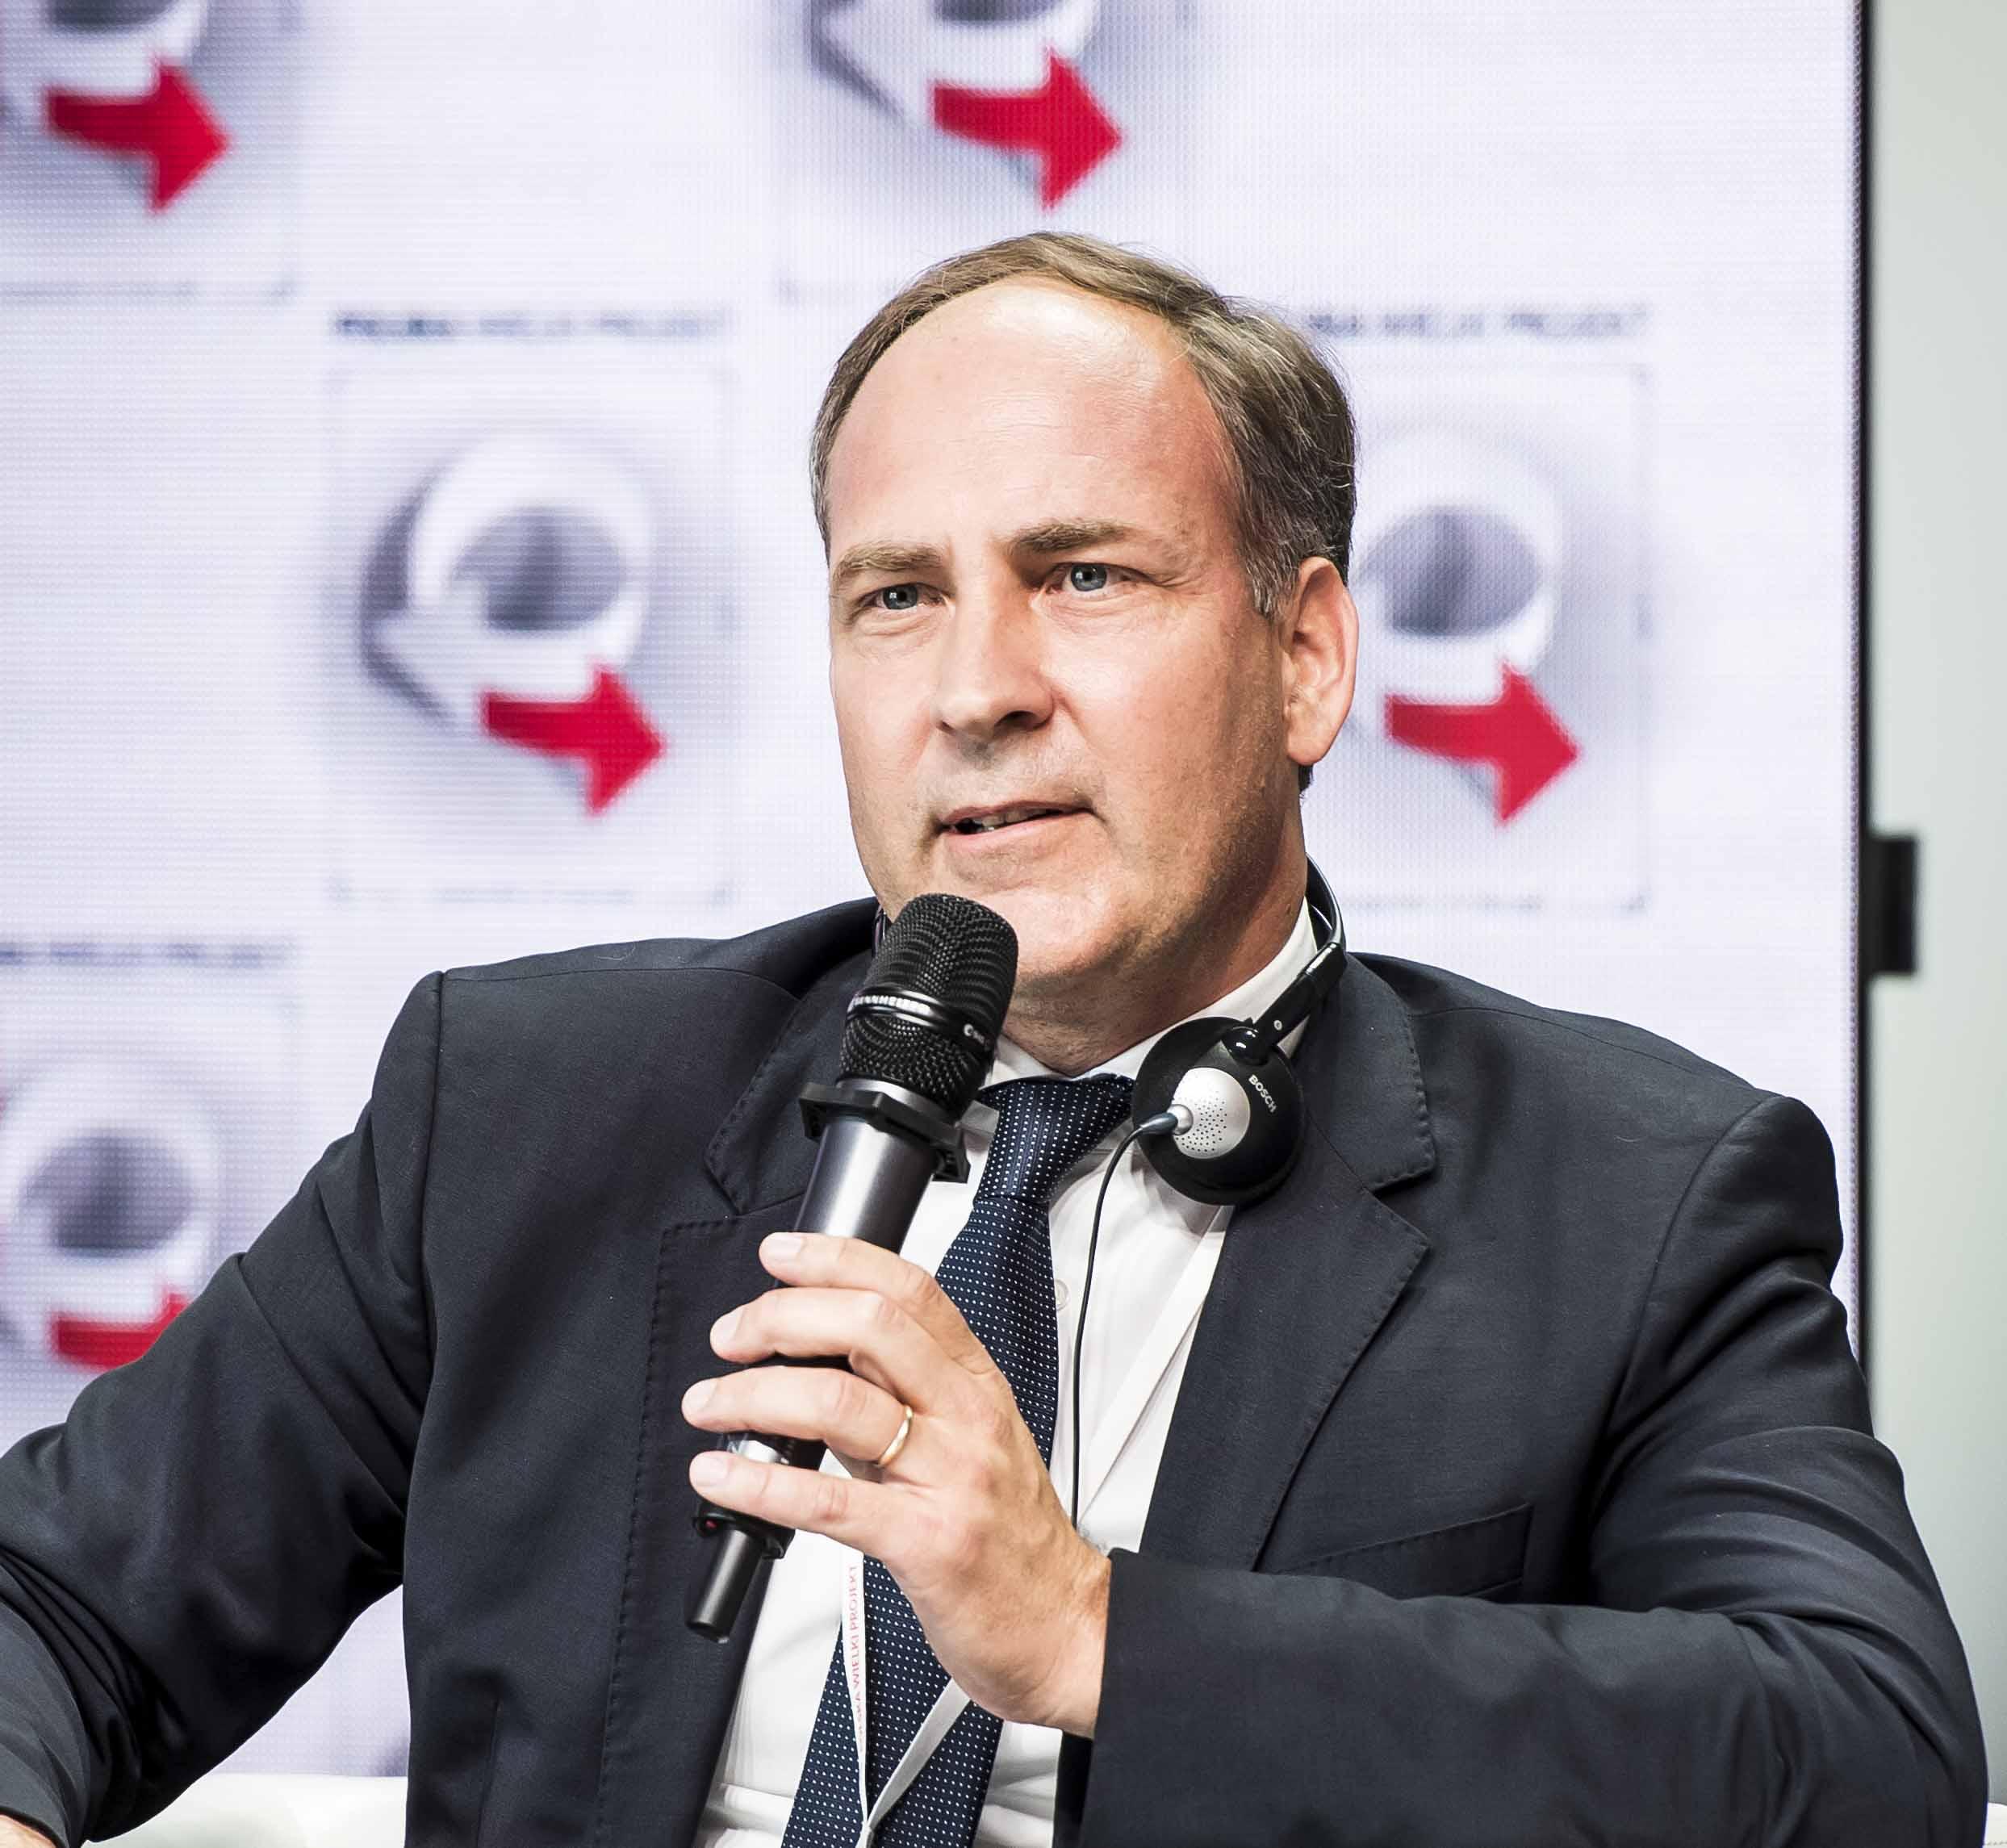 Stjepo Bartulica, Kongres polska wielki projekt